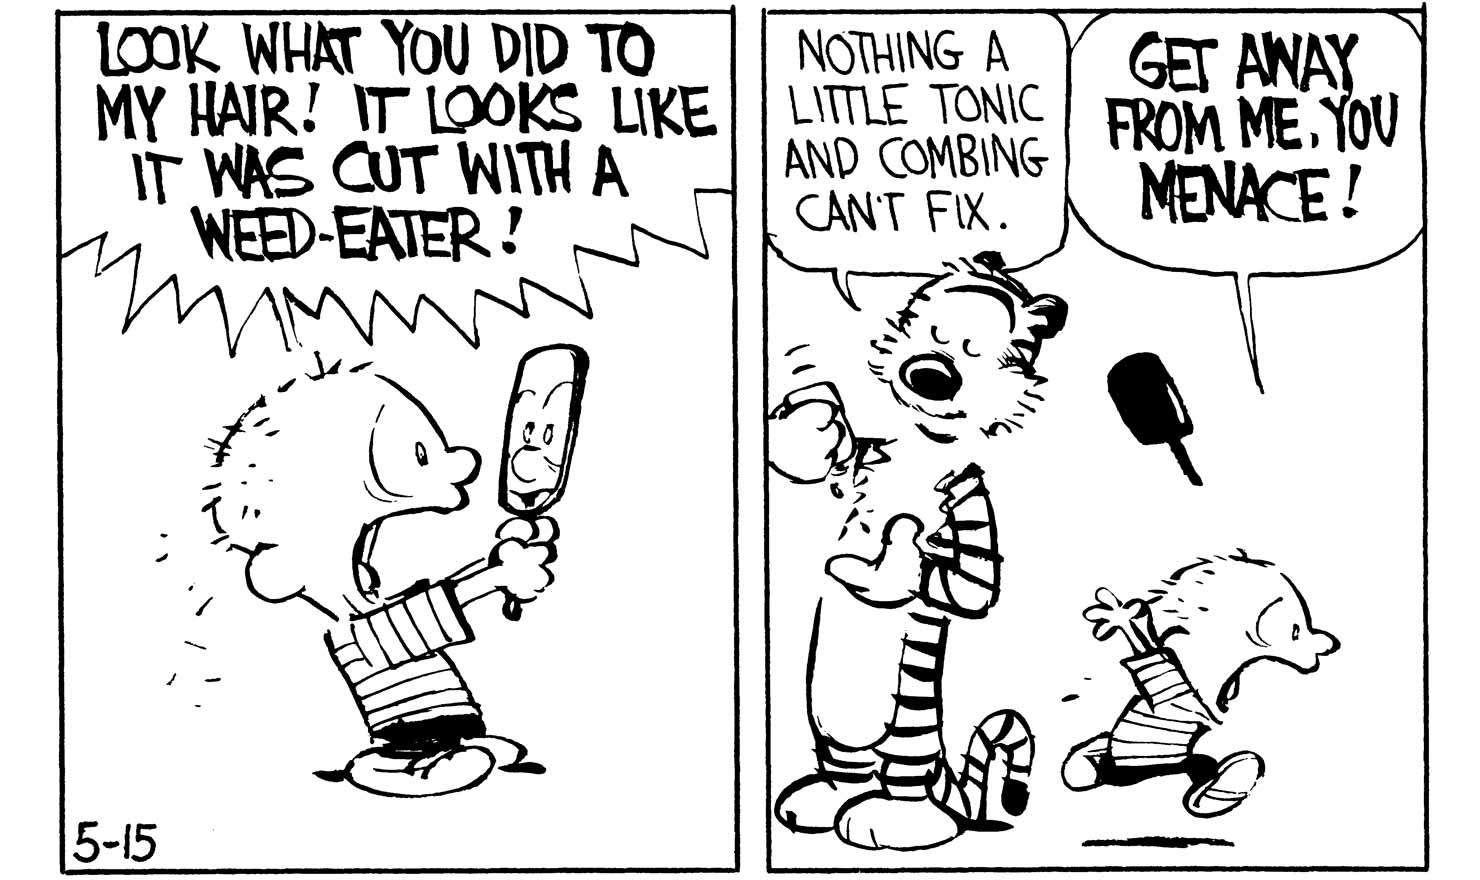 Calvin S Bad Hair Daze Gocomics Com Calvin And Hobbes Comics Calvin And Hobbes Comics